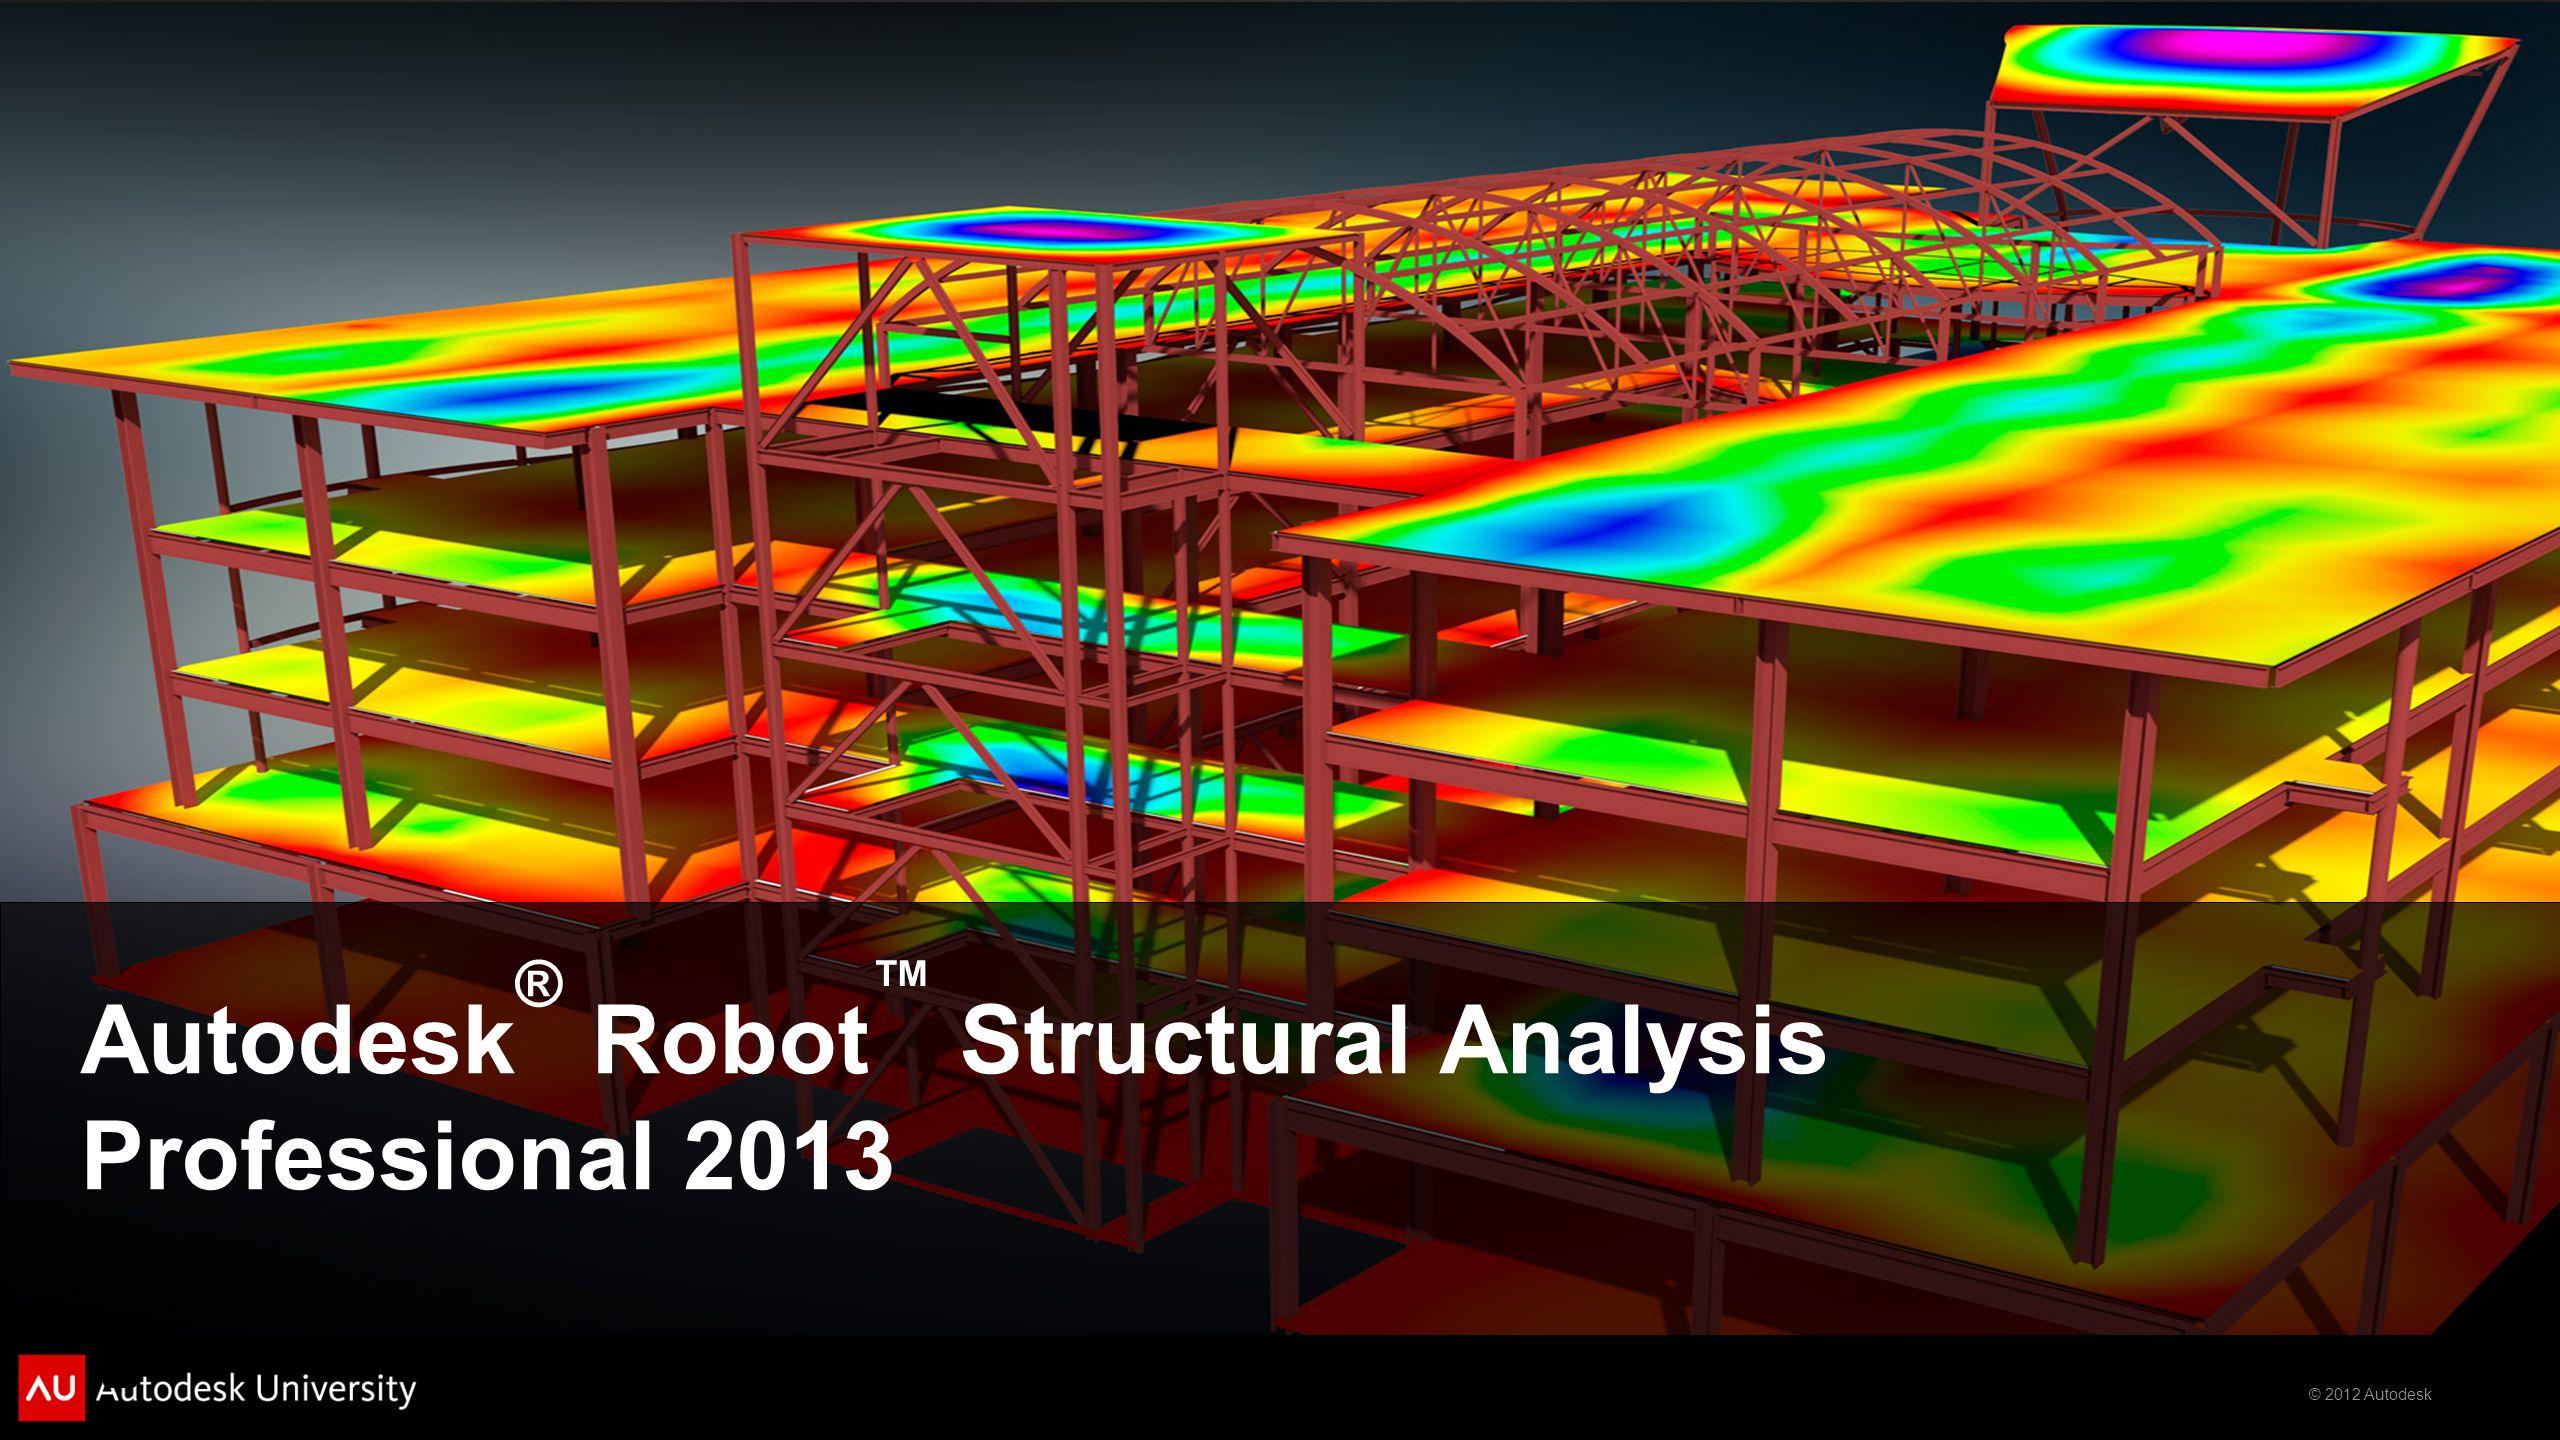 © 2012 Autodesk Autodesk ® Robot ™ Structural Analysis Professional 2013